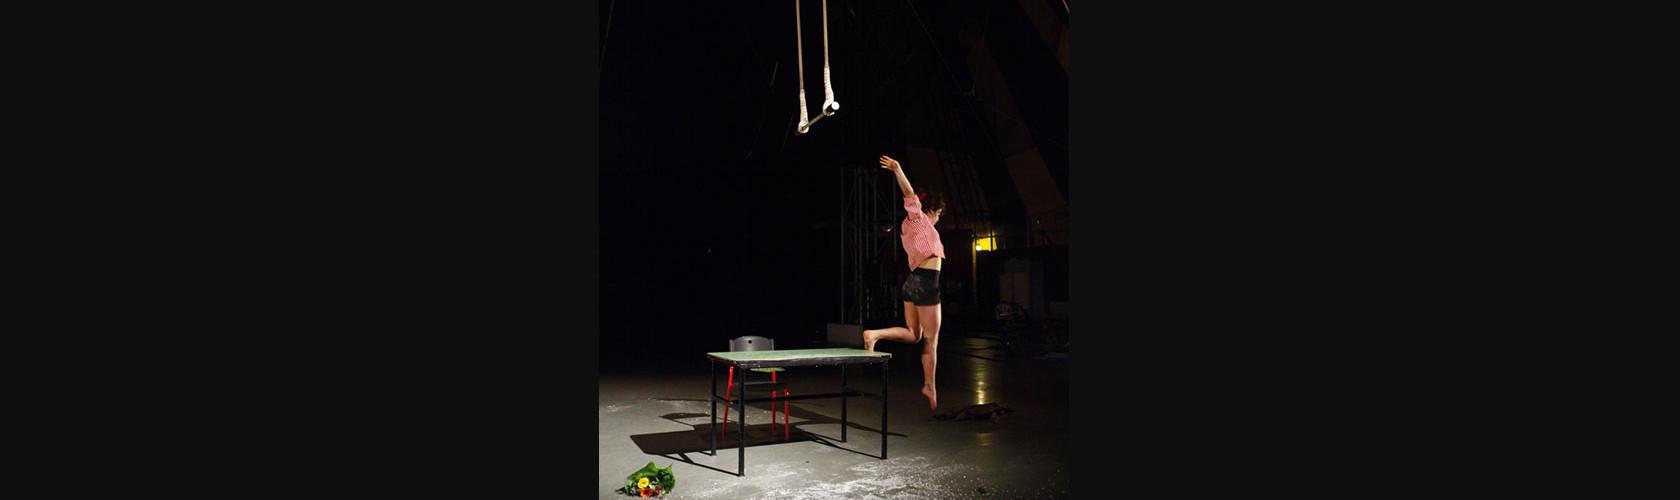 Etudiante de l'Enacr. Cirque contemporain. Photo © Philippe Cibille